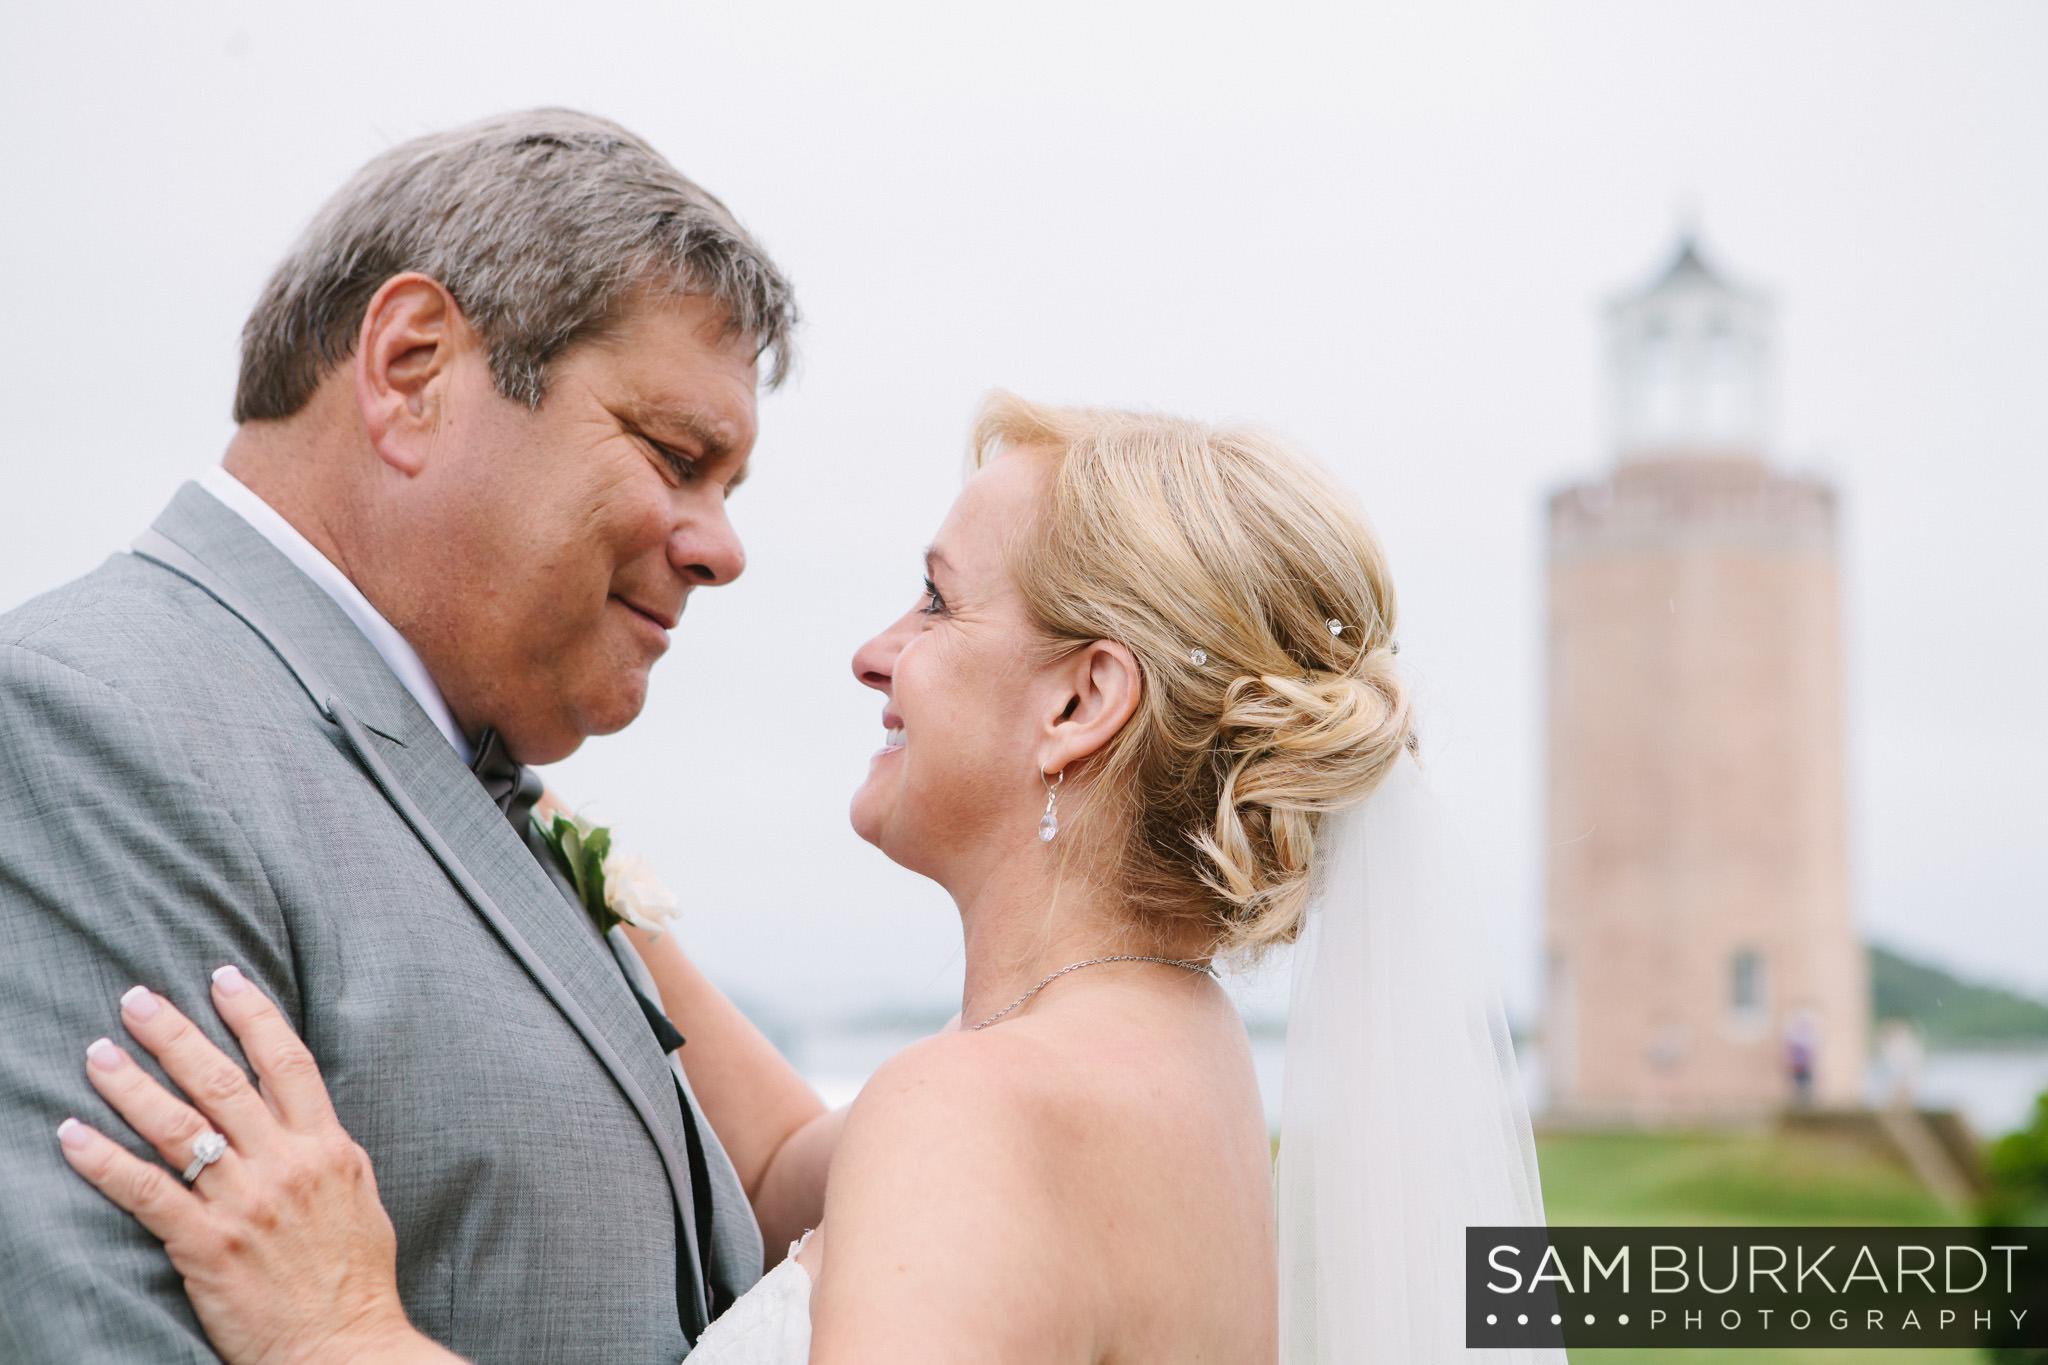 samburkardt_branford_house_groton_connecticut_wedding_0004.jpg